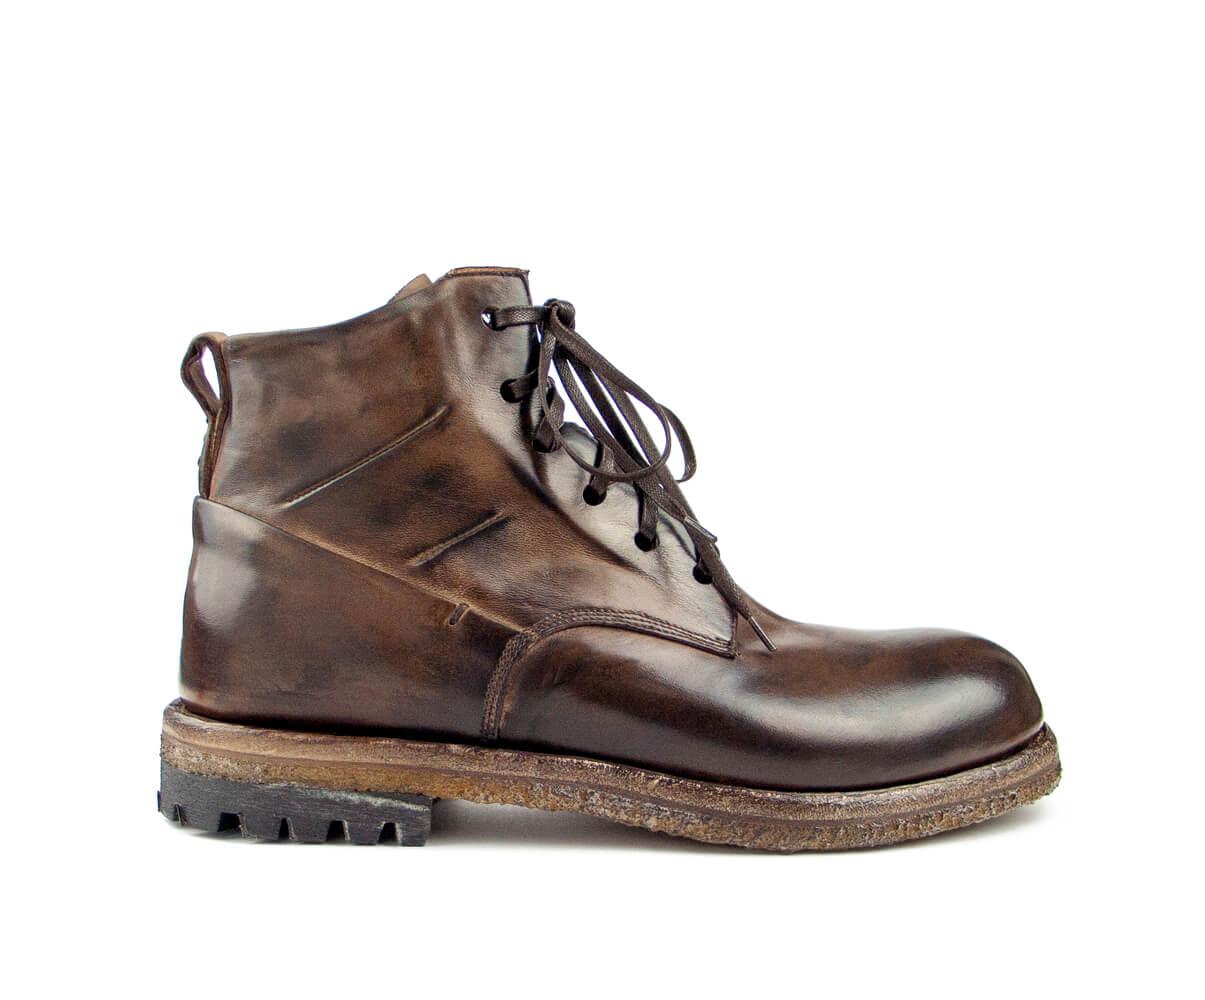 018 ecla scarpe rgb